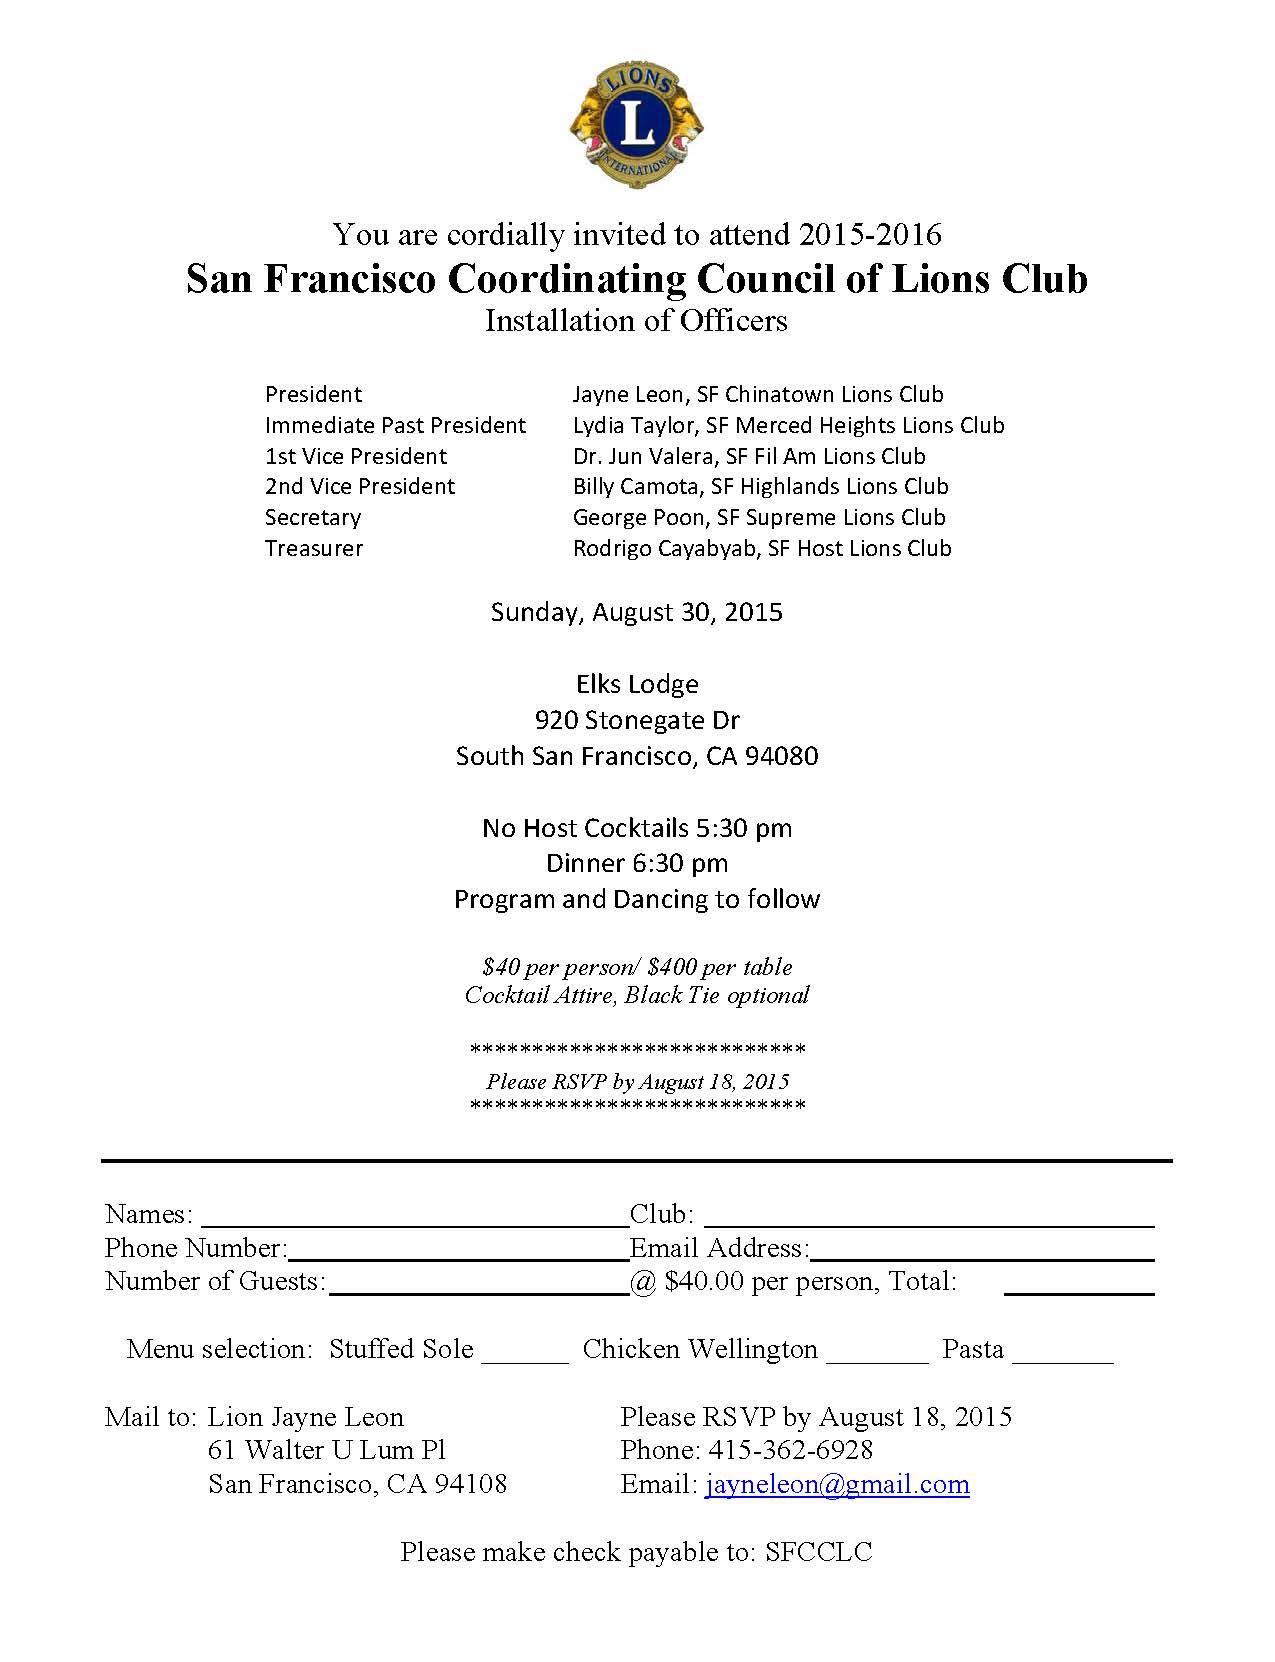 SFCCLC Installation August 30, 2015